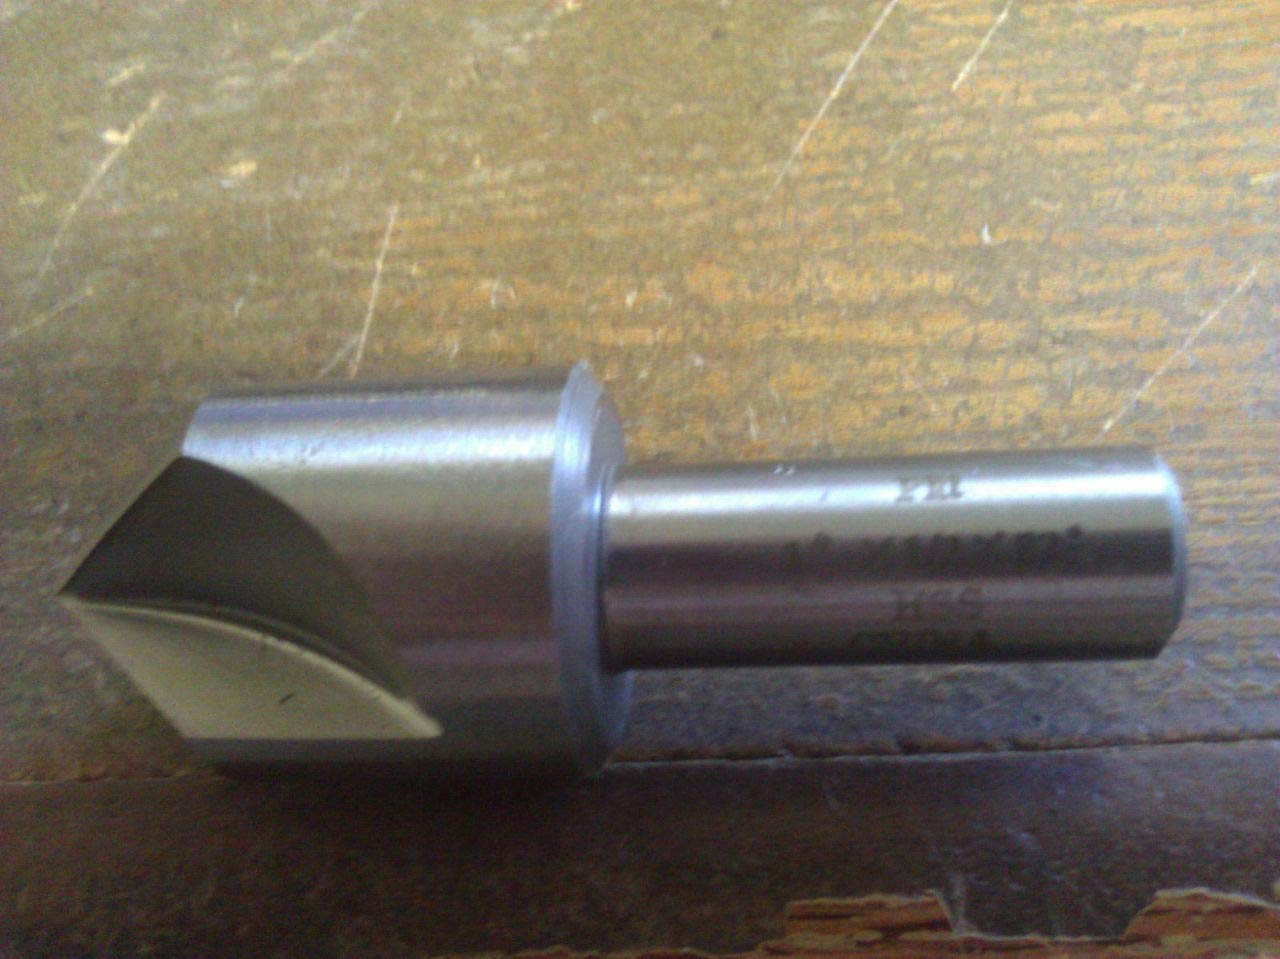 1 60 Degree HIGH Speed Steel 3 Flute Countersink 1//2 Shank